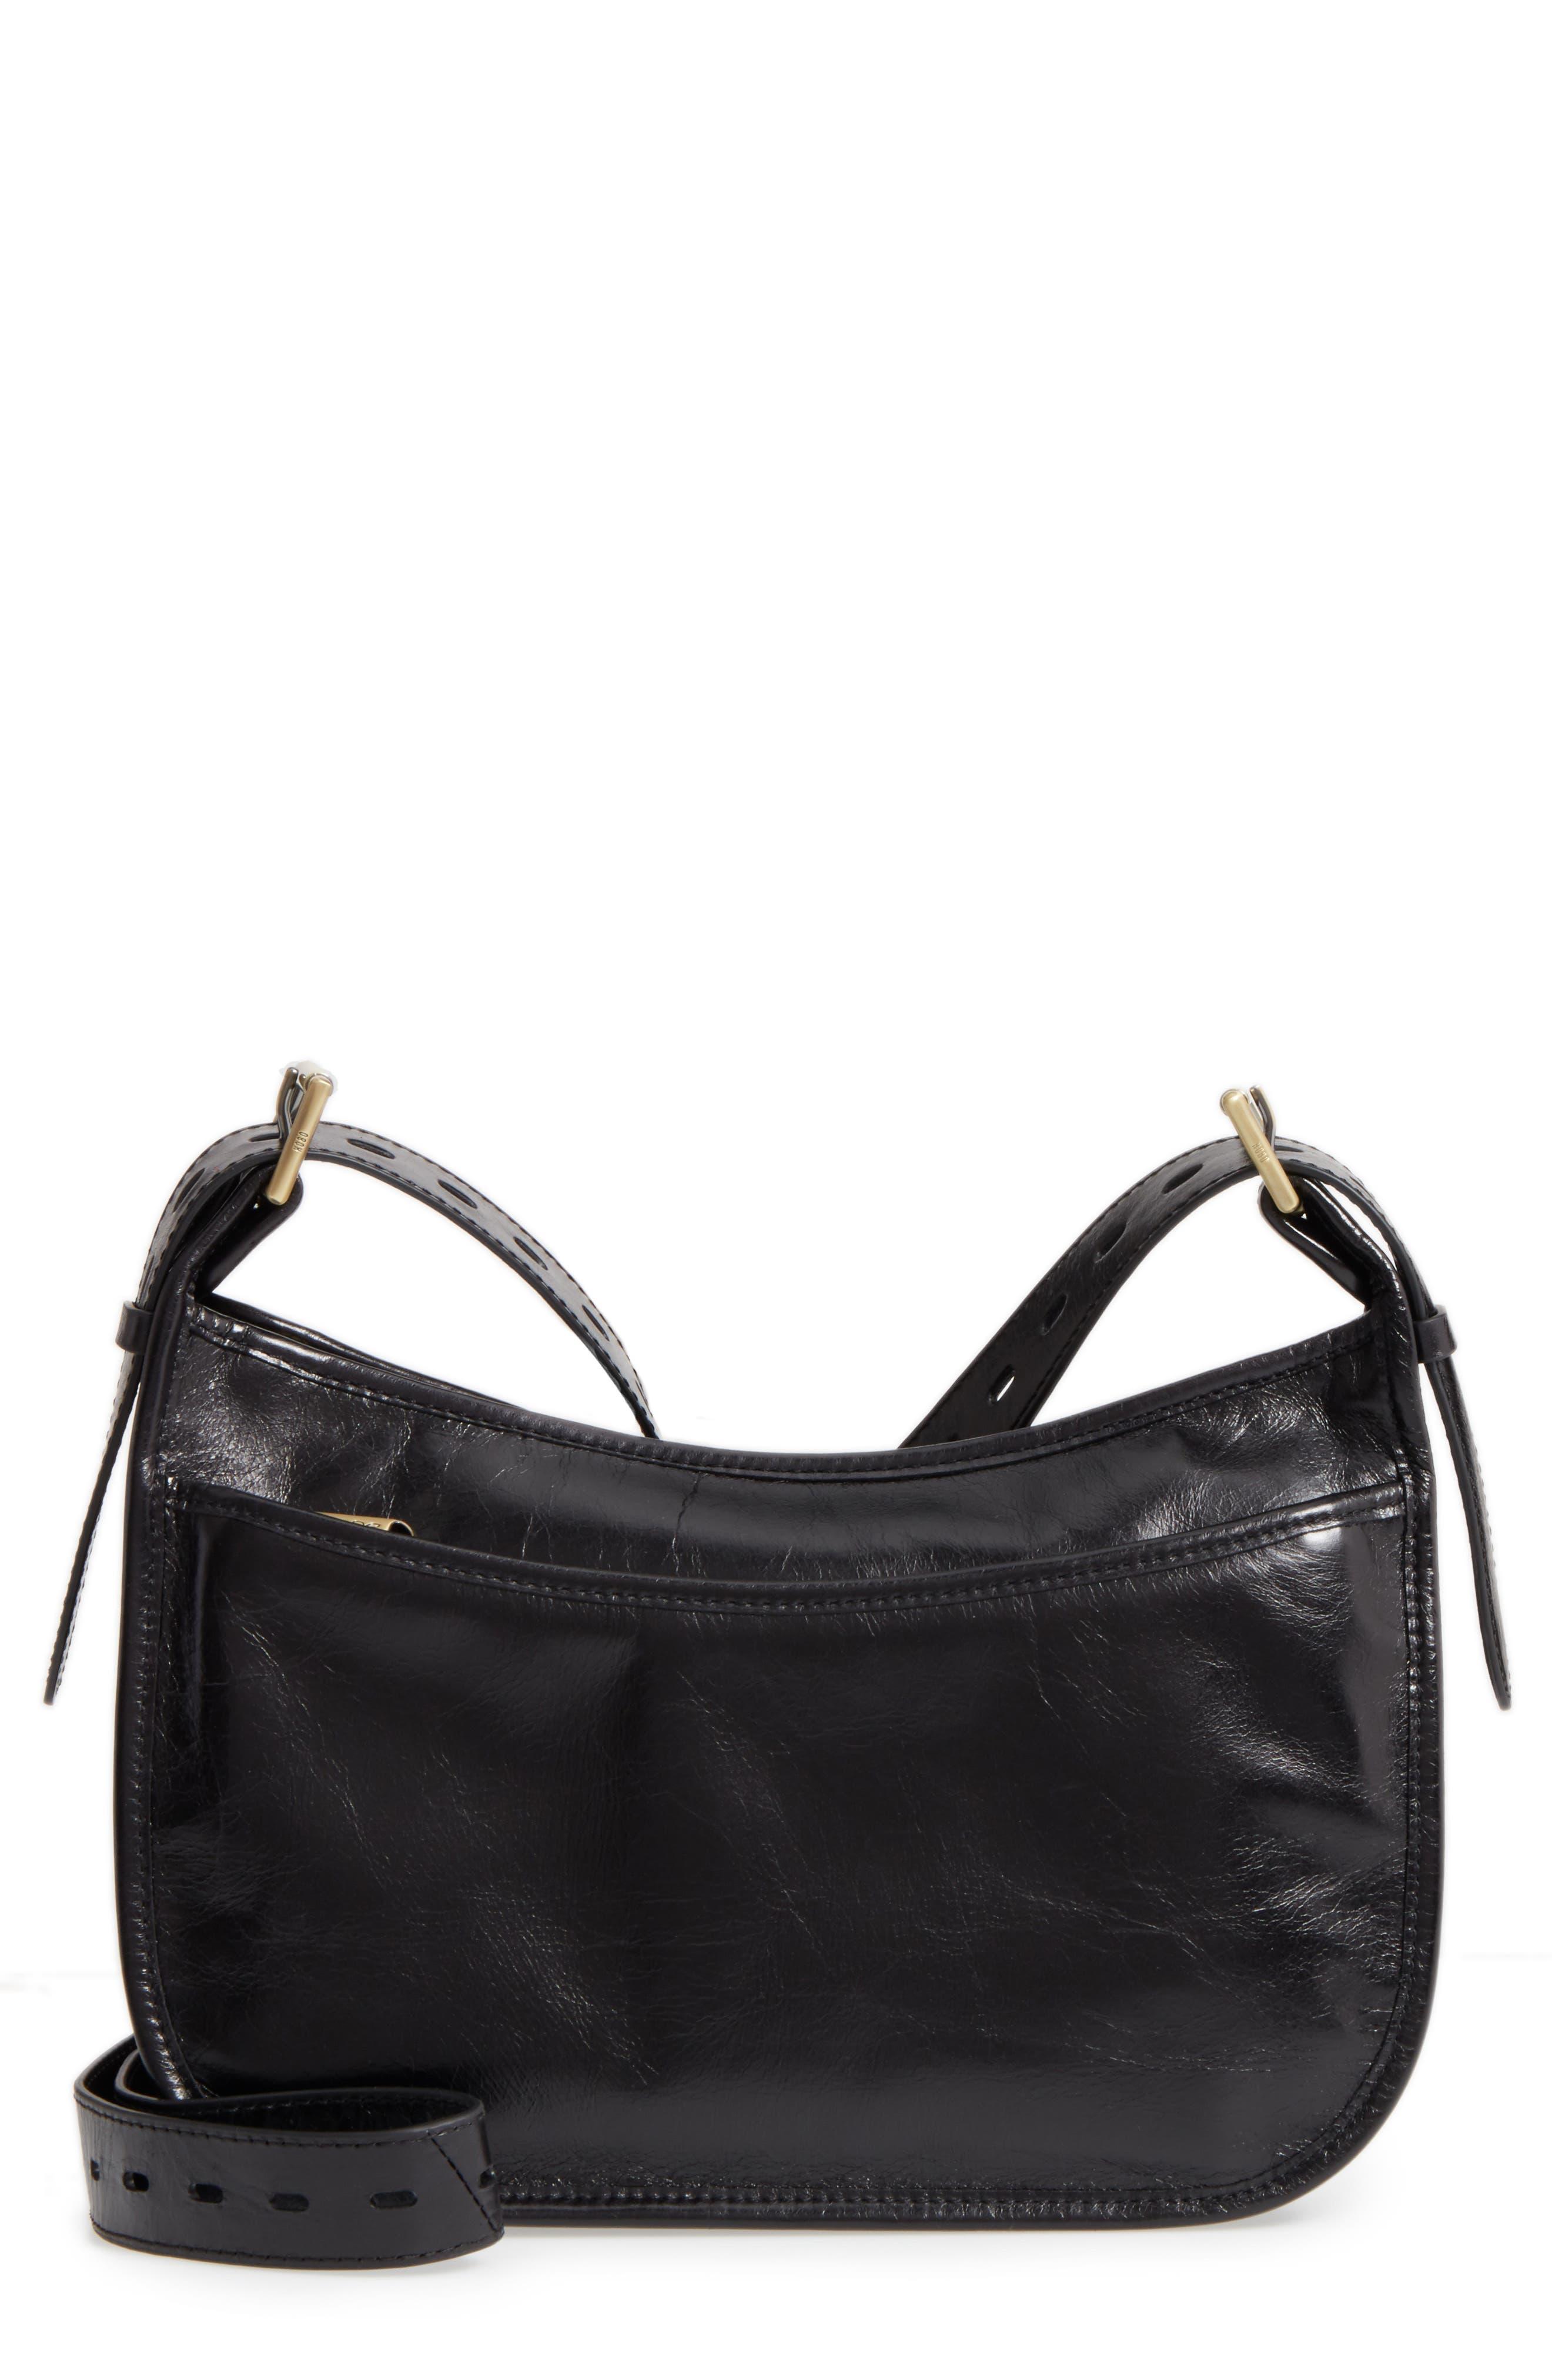 Chase Calfskin Leather Crossbody Bag,                             Main thumbnail 1, color,                             BLACK